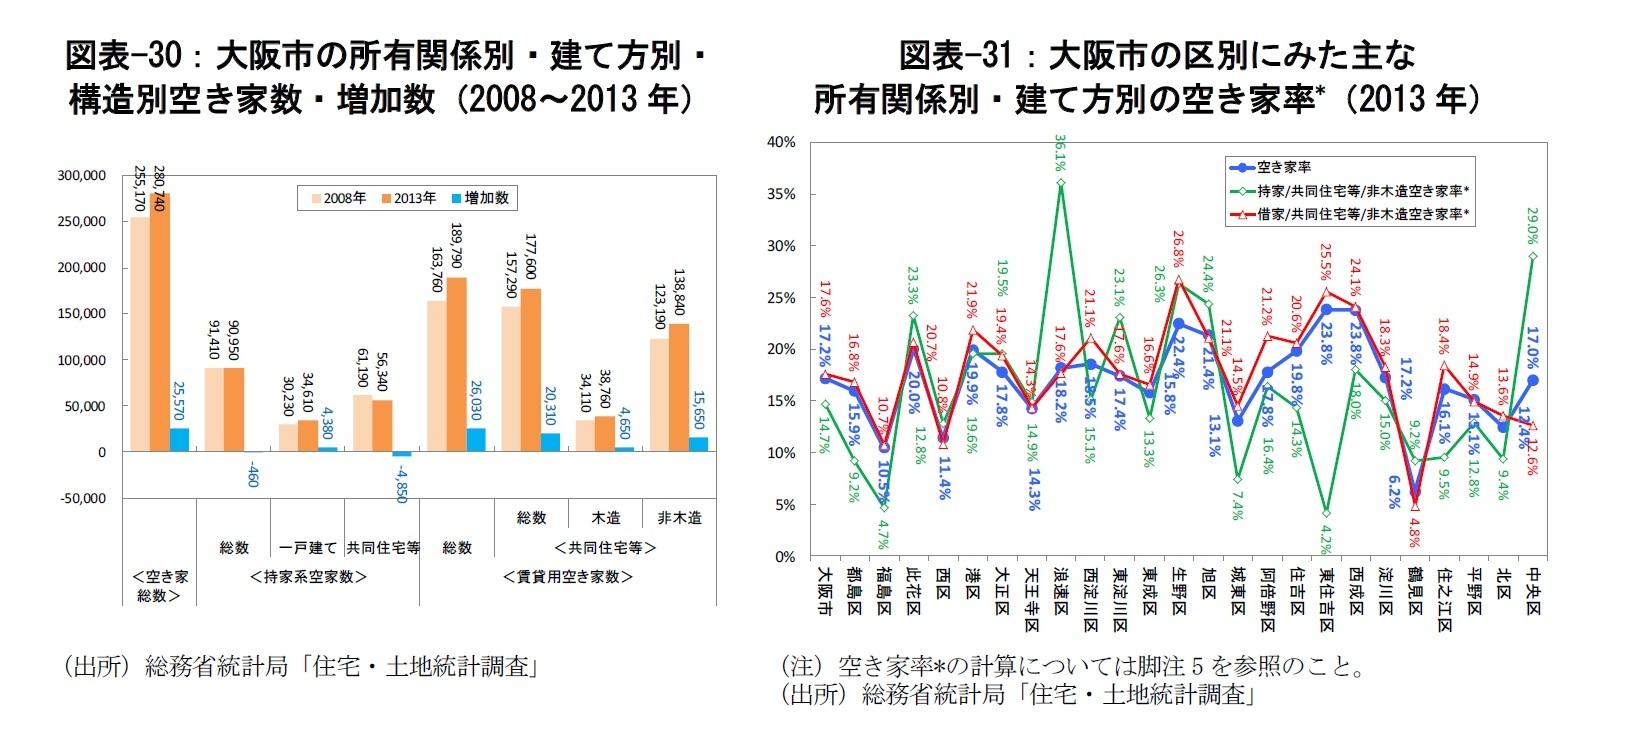 図表-30:大阪市の所有関係別・建て方別・構造別空き家数・増加数(2008~2013年)/図表-31:大阪市の区別にみた主な所有関係別・建て方別の空き家率*(2013年)